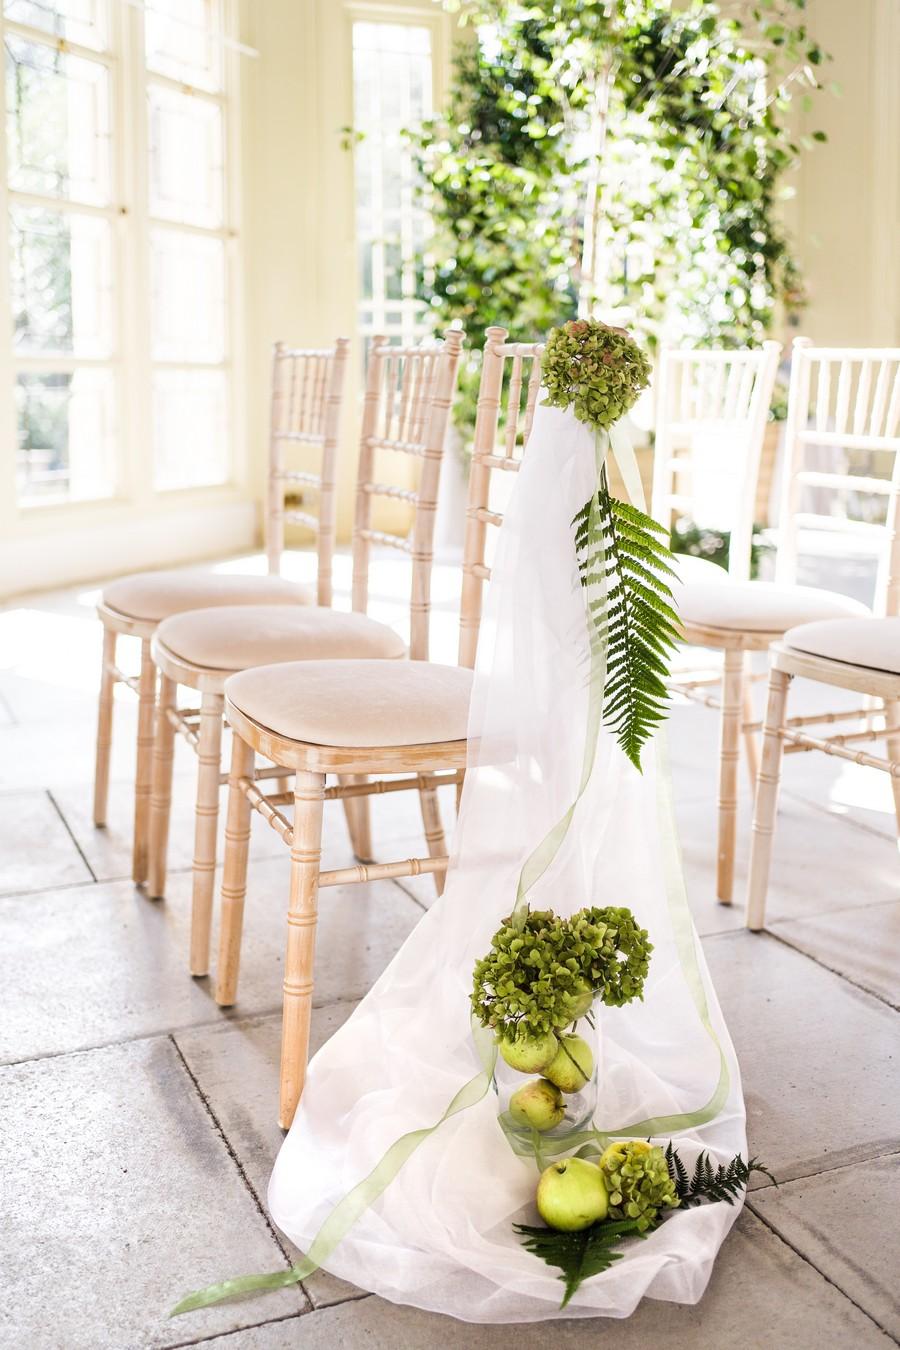 Highcliffe Castle wedding inspiration on the English Wedding Blog (7)